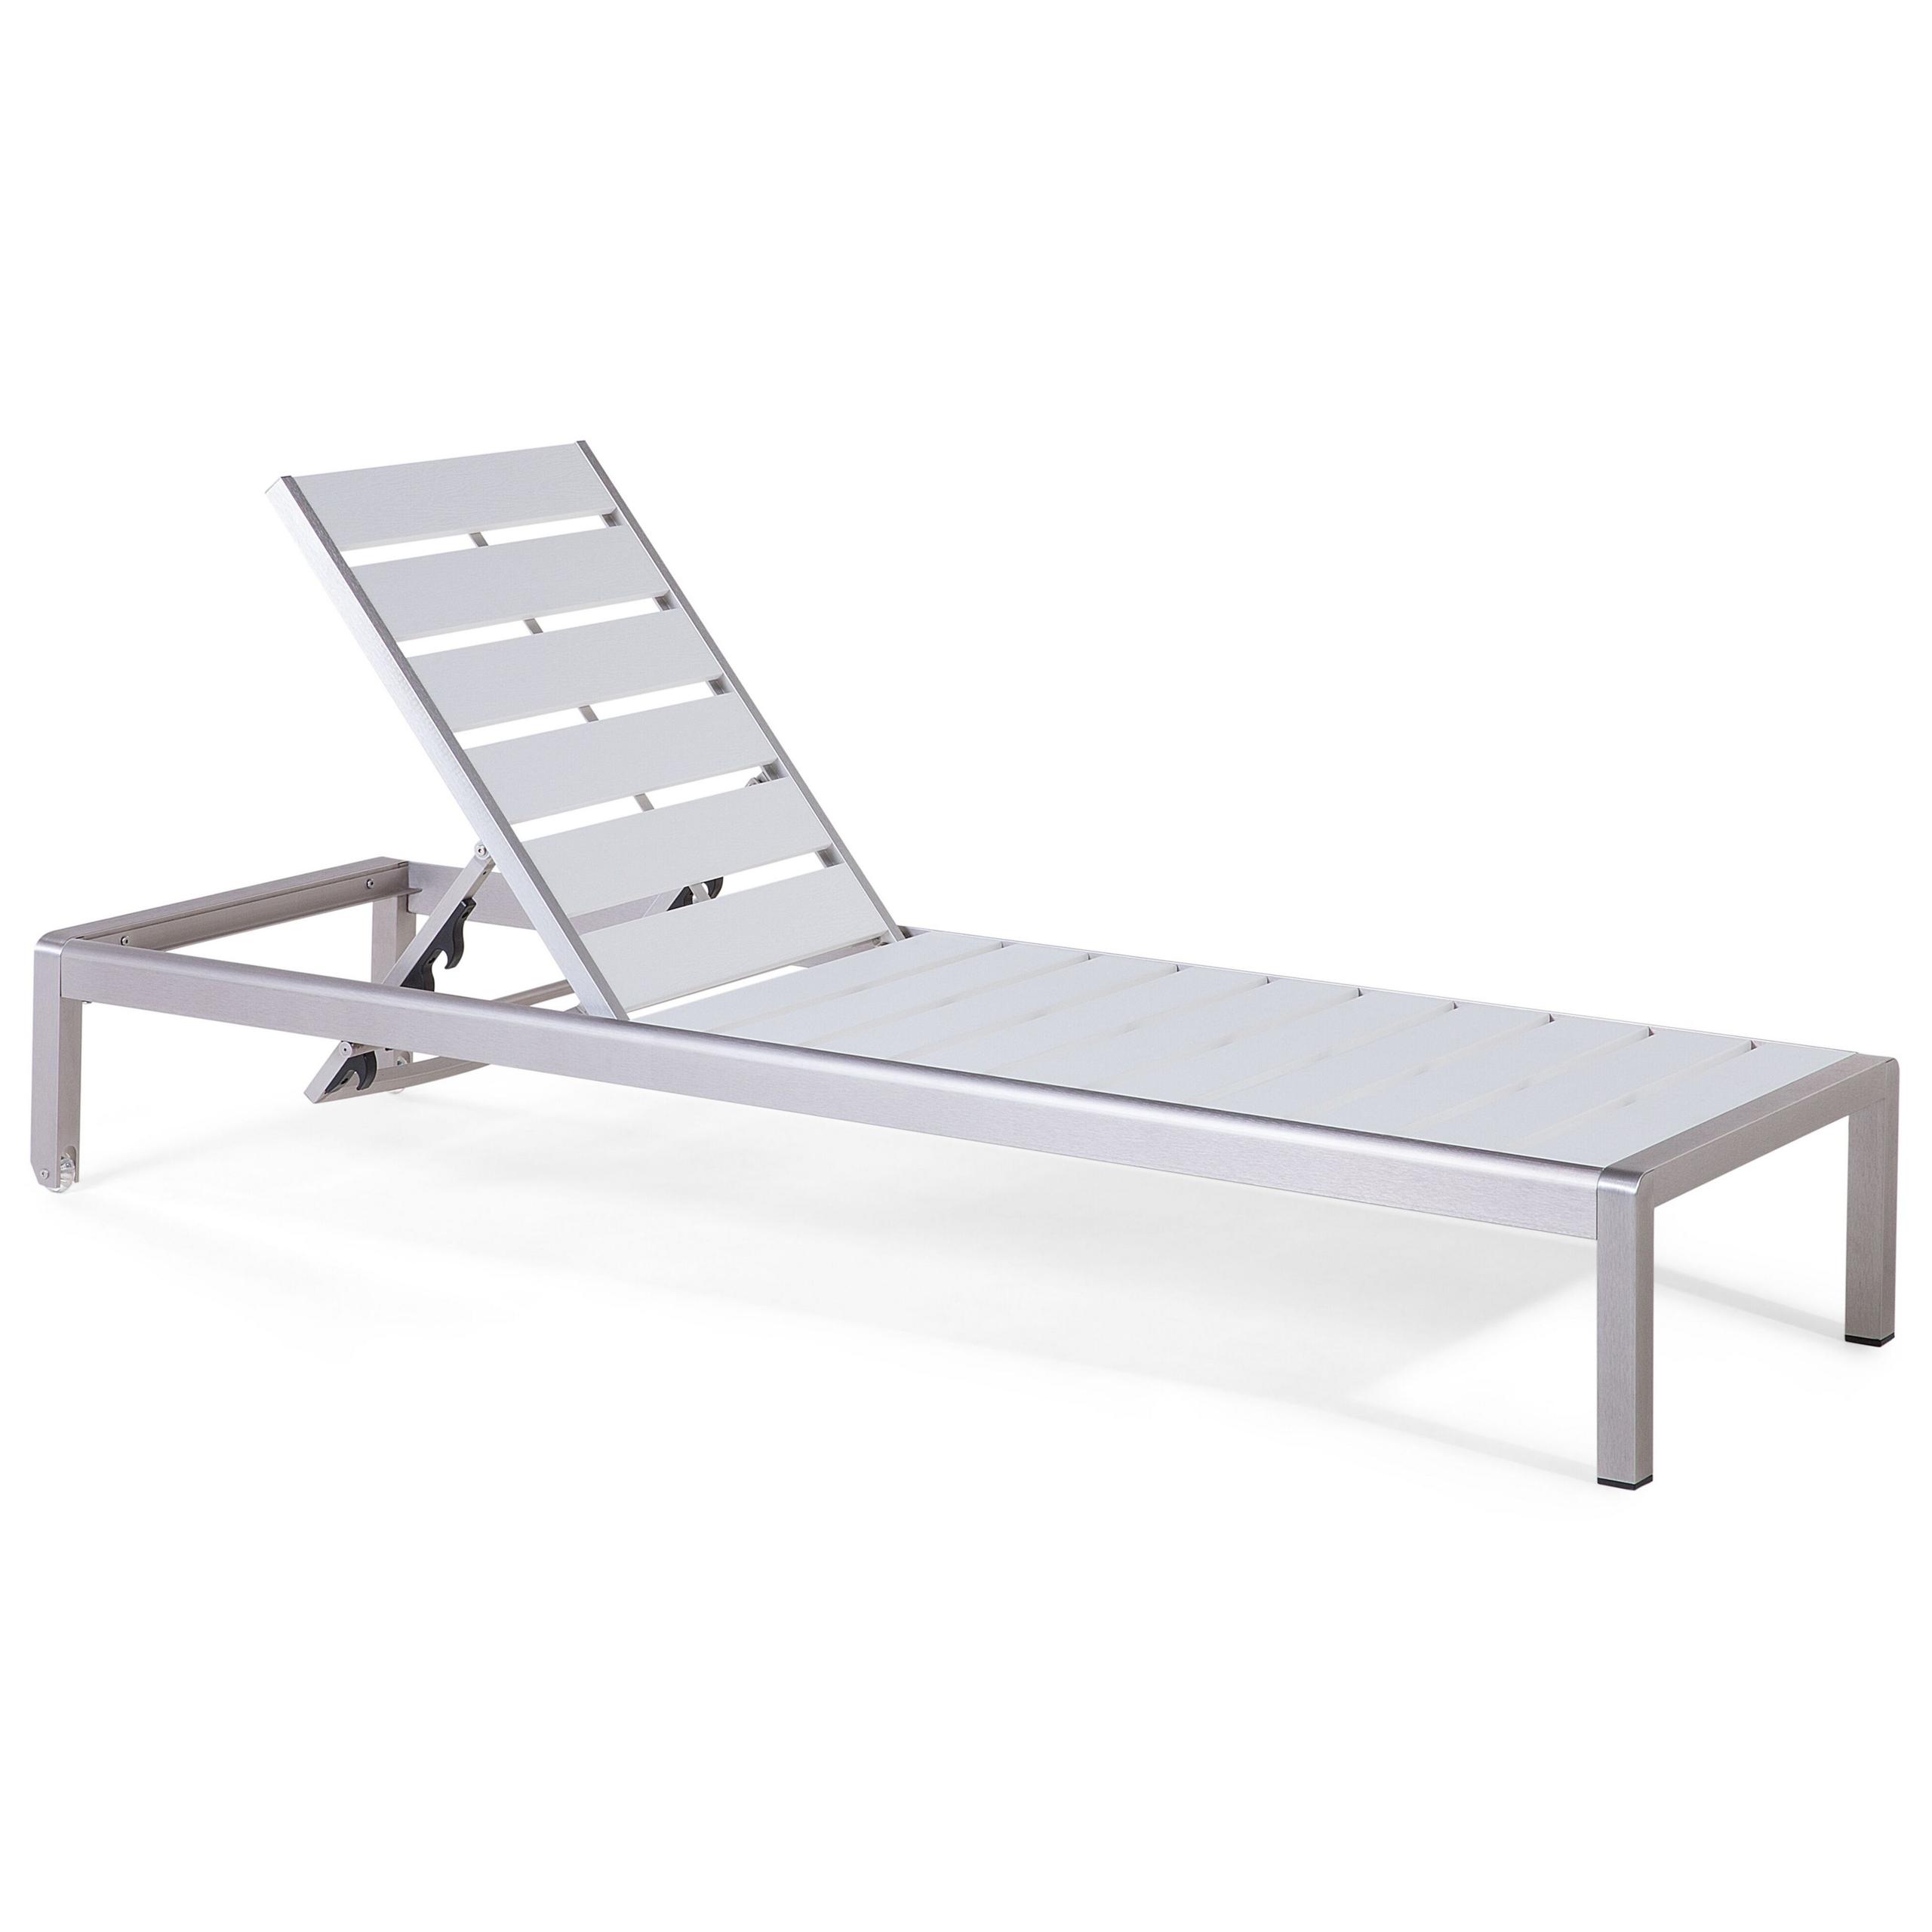 Beliani Garden Outdoor Lounger White Manufactured Wood Aluminium Frame Adjustable Reclining Backrest